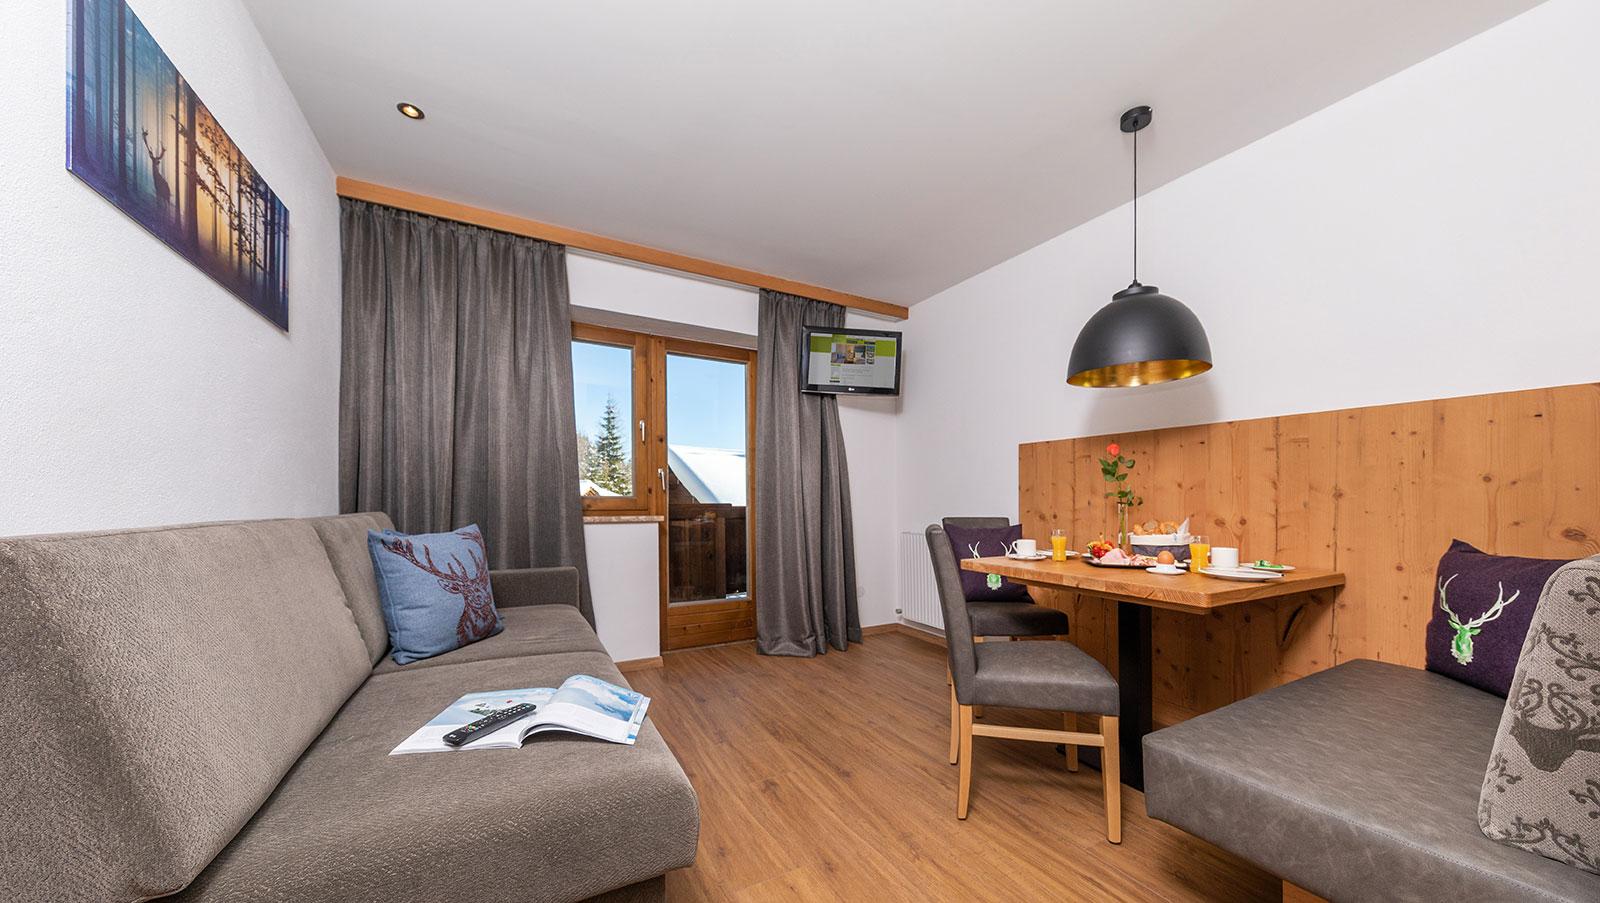 Hotel Grünholz - Zimmer & Appartements